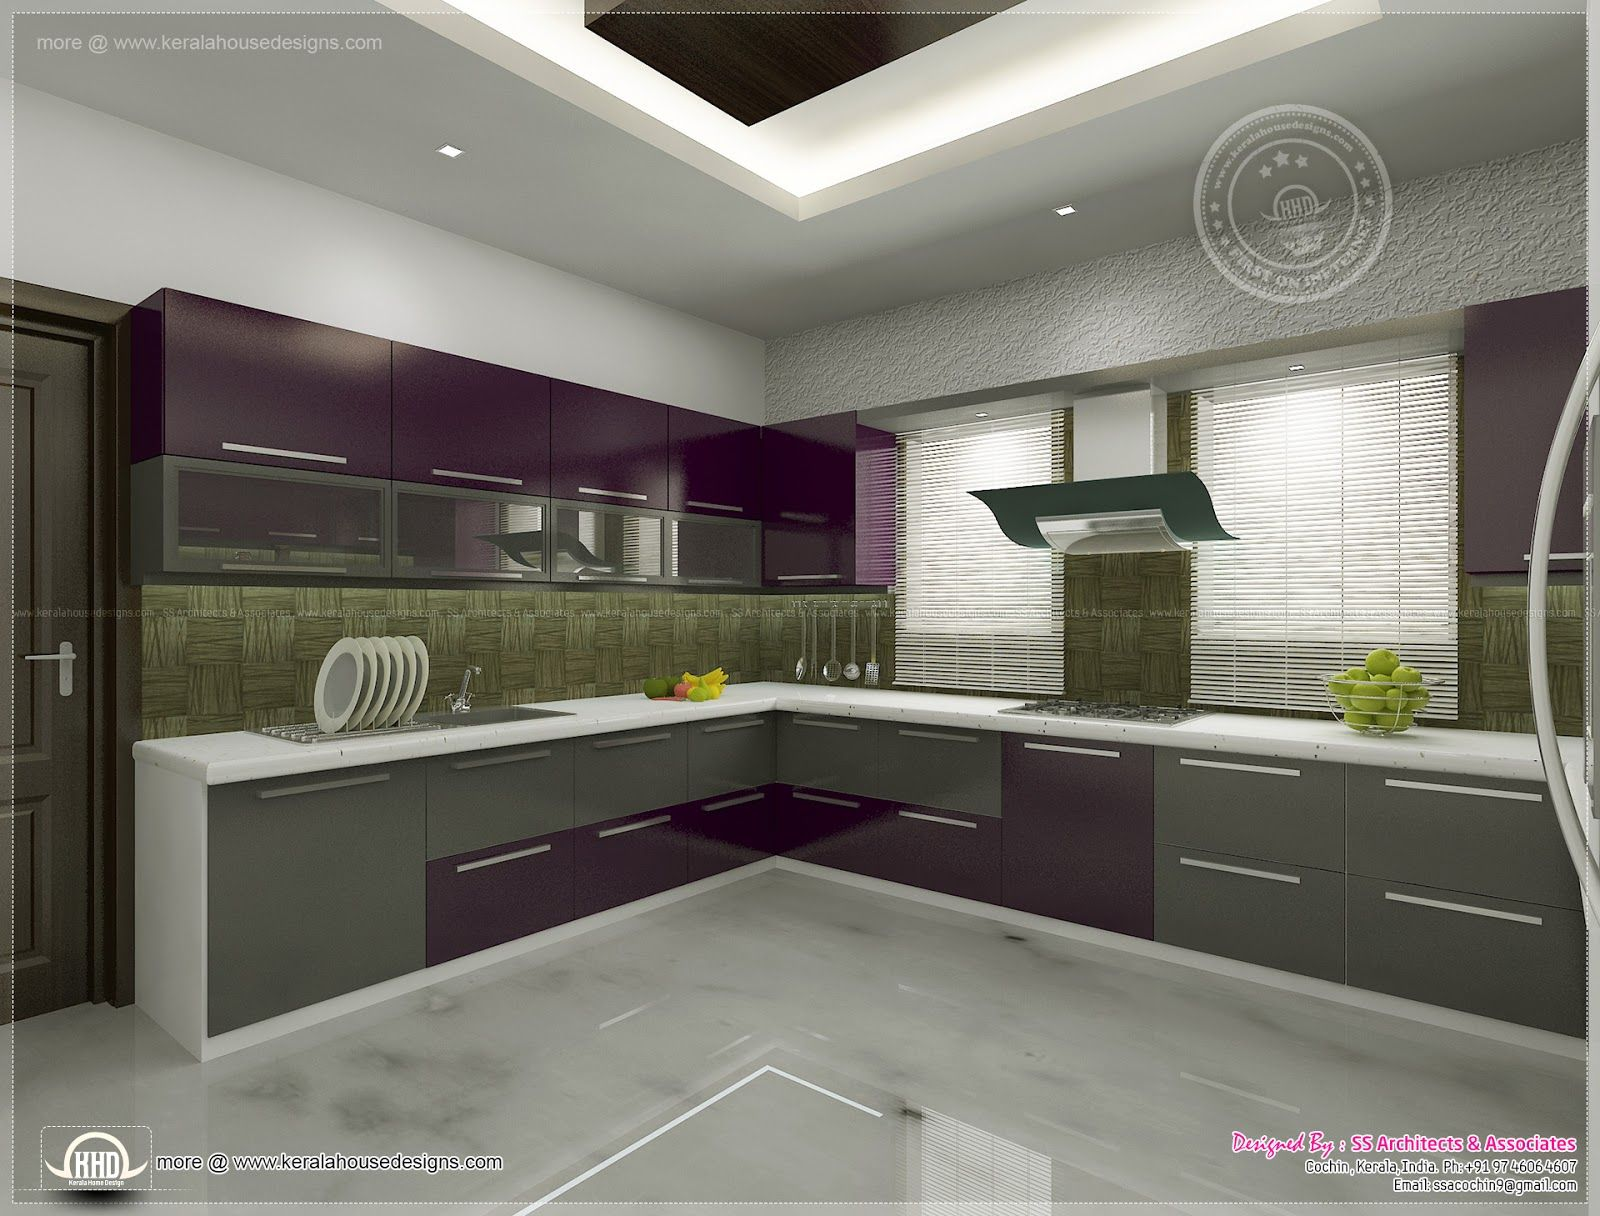 99 Interior Home Design Ideas Interior Design Kitchen Kitchen Design Decor Kitchen Cabinet Design Photos